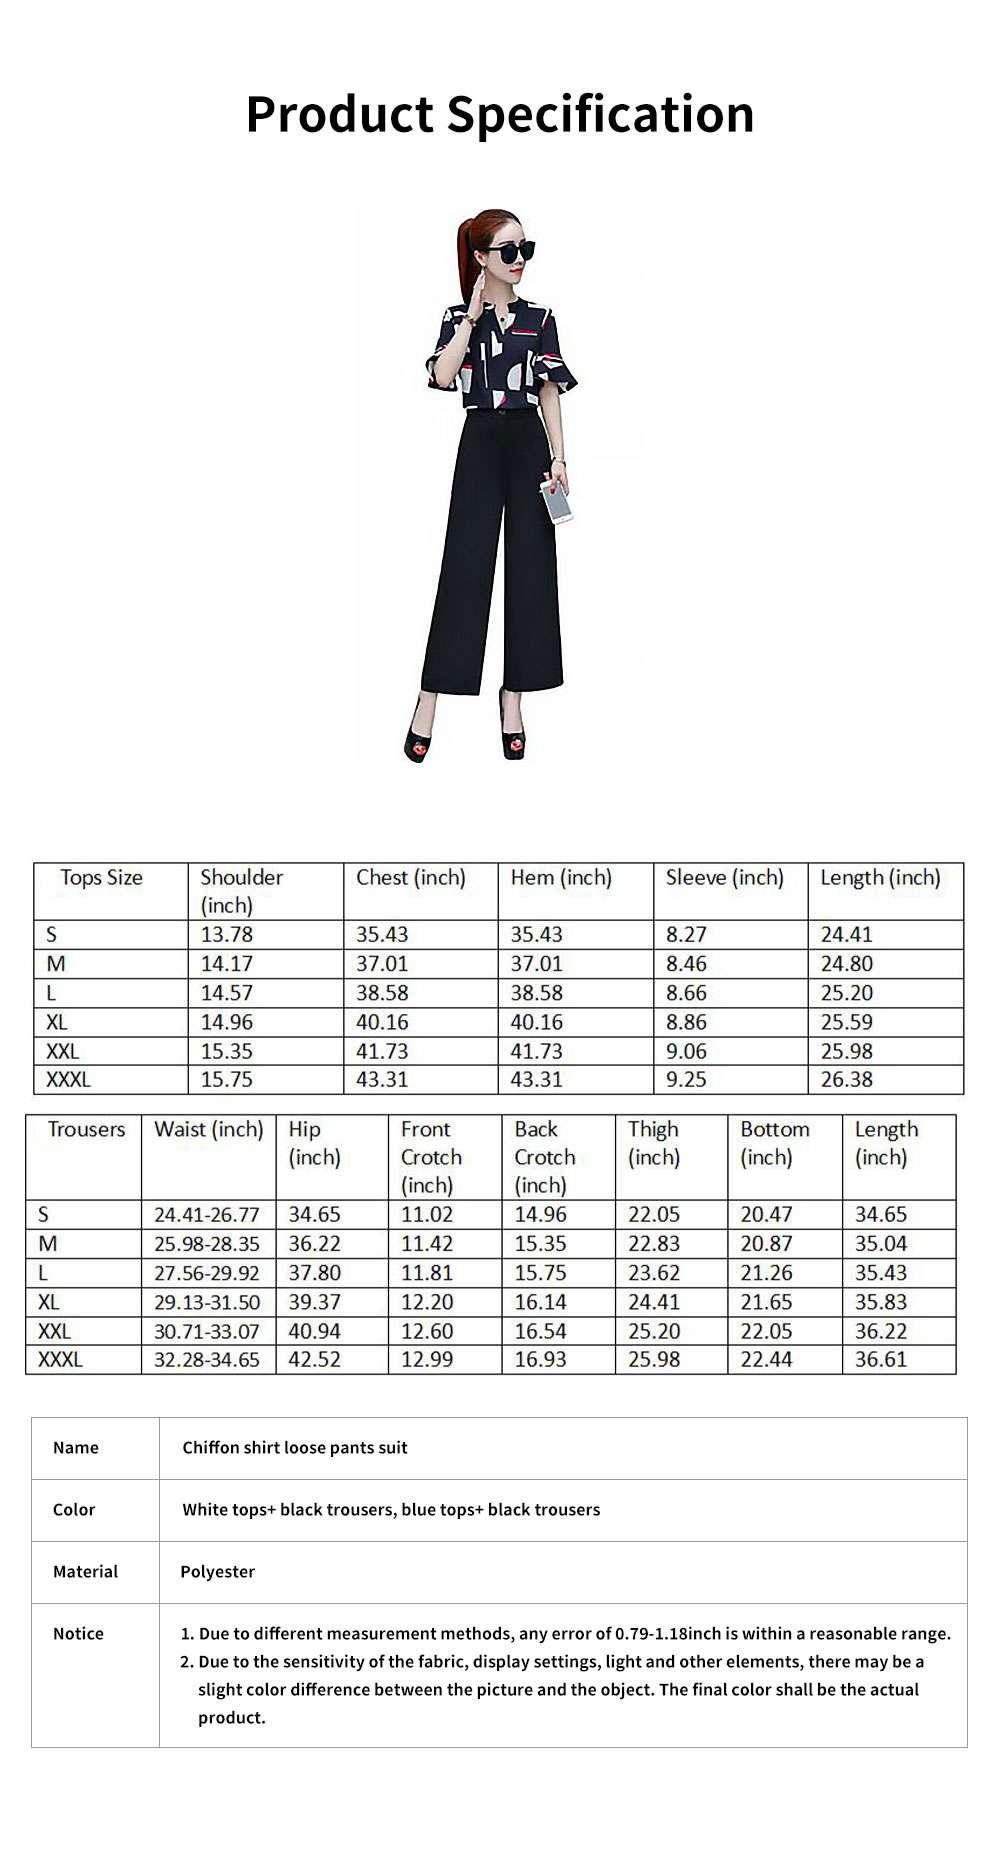 Stylish V-Neck Line Chiffon Shirt Loose Pants Suit for Ladies Minimalist Geometric Figure Pattern Decorative Tops with Falbala Sleeves 7